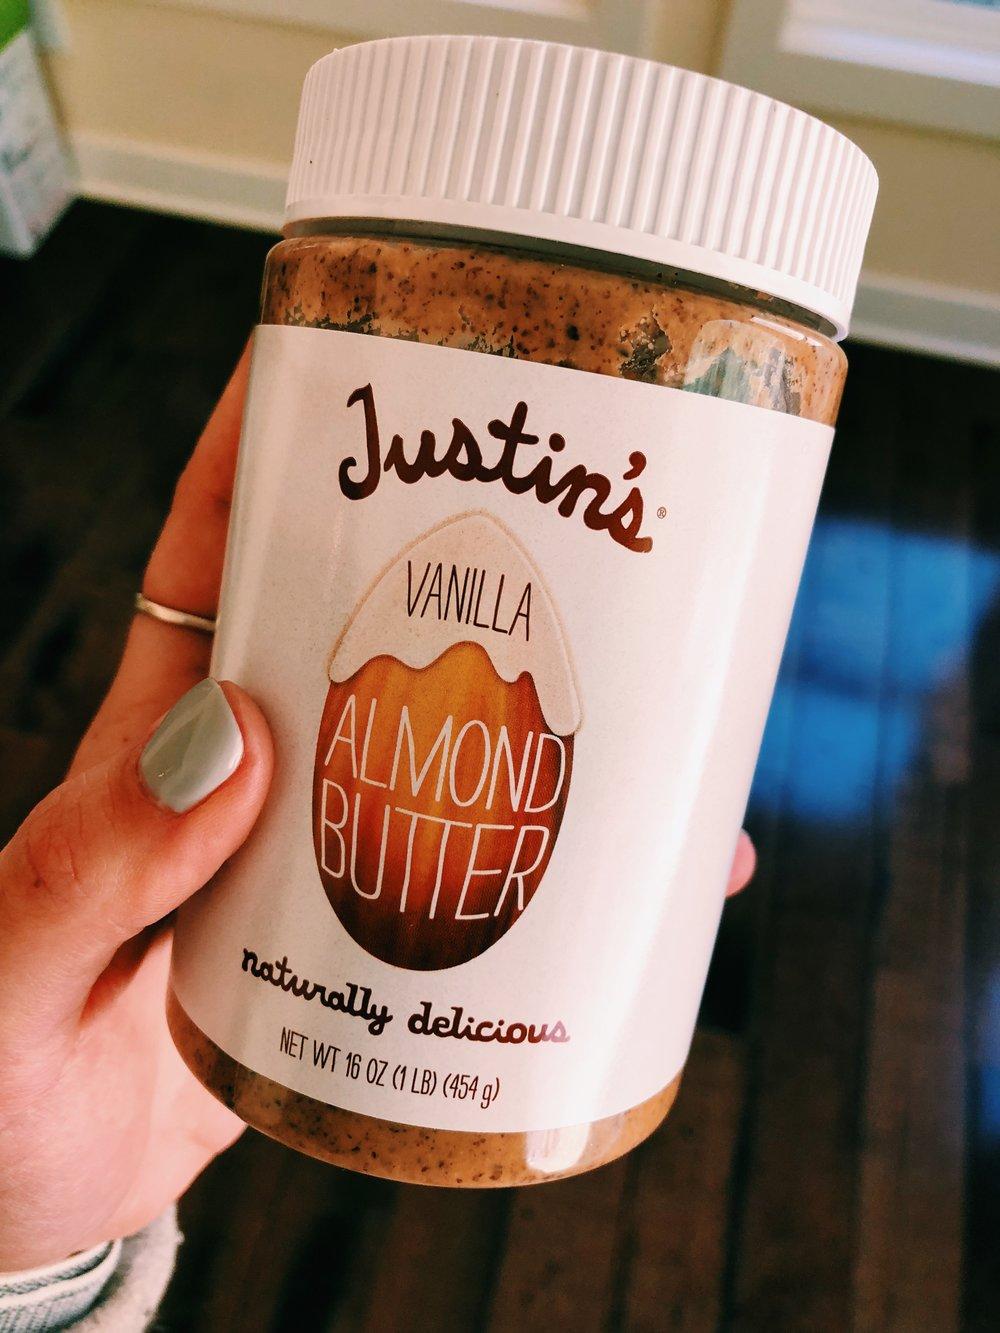 Justins-Vanilla-Almond-Butter